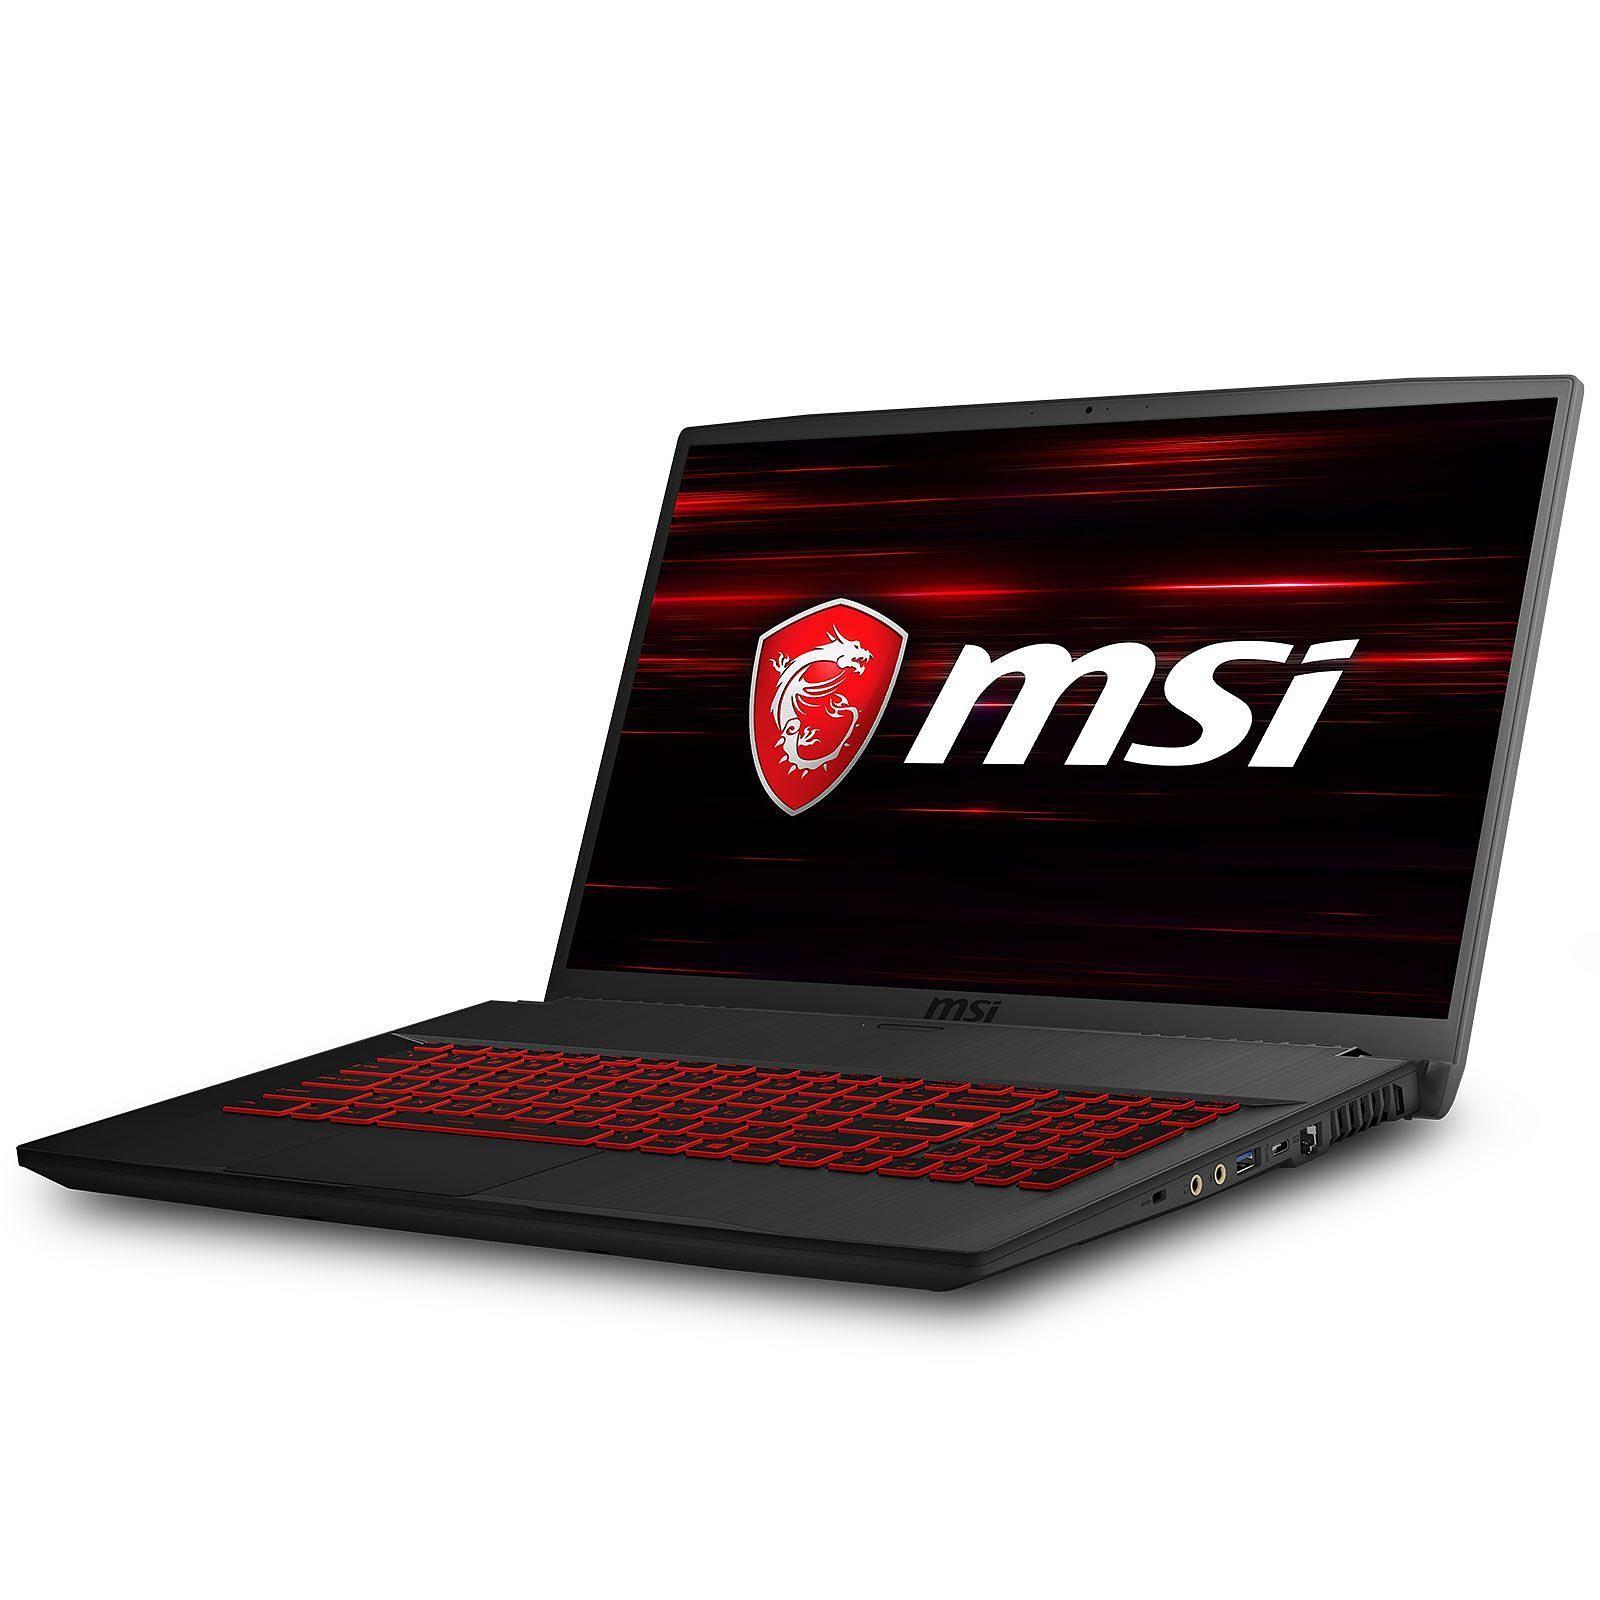 MSI 9S7-17F312-286 - PC portable MSI - Cybertek.fr - 4